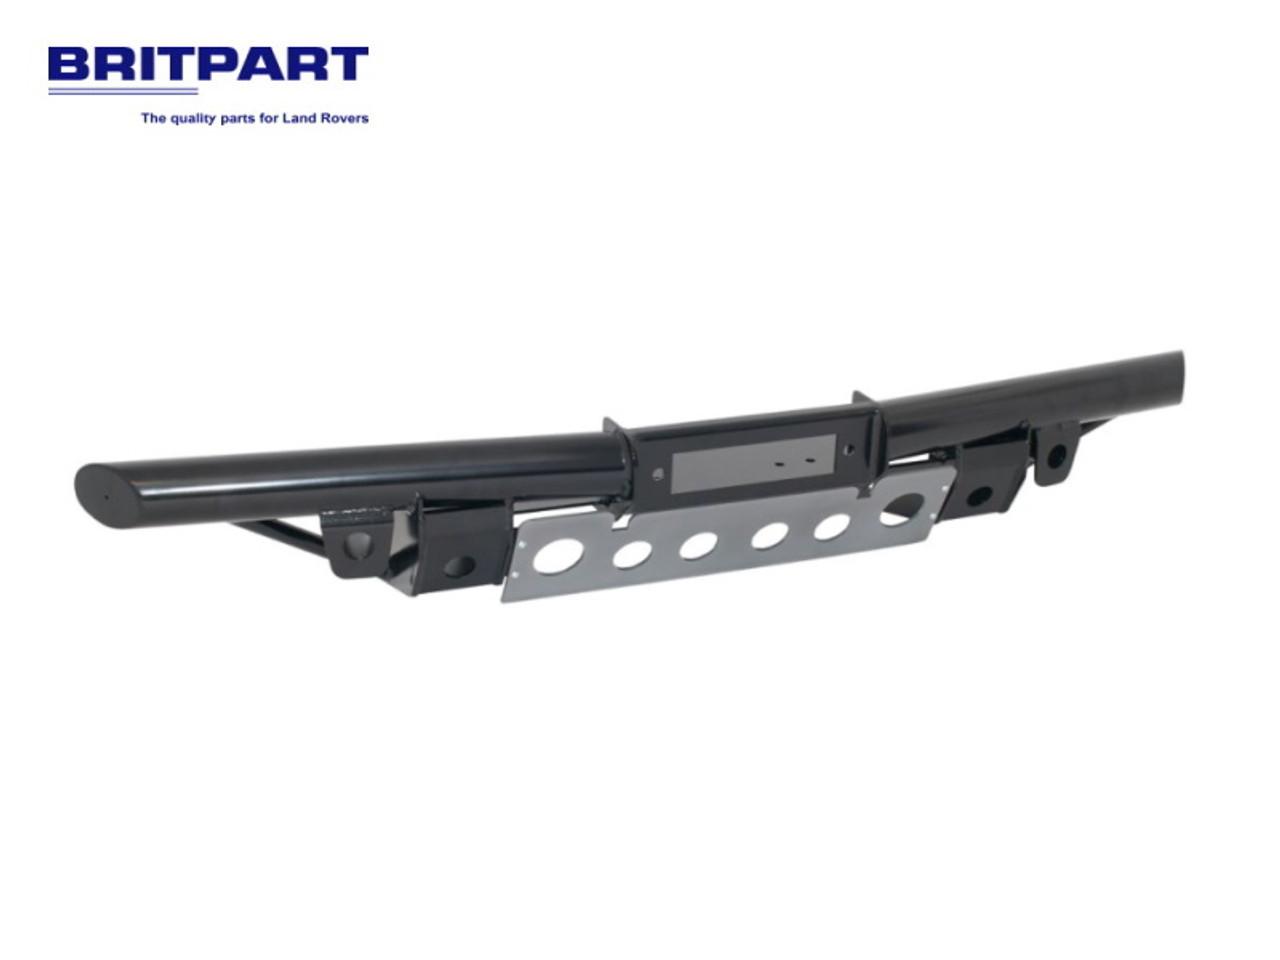 Britpart Black Tubular Winch Bumper Without Air Con - DA5622